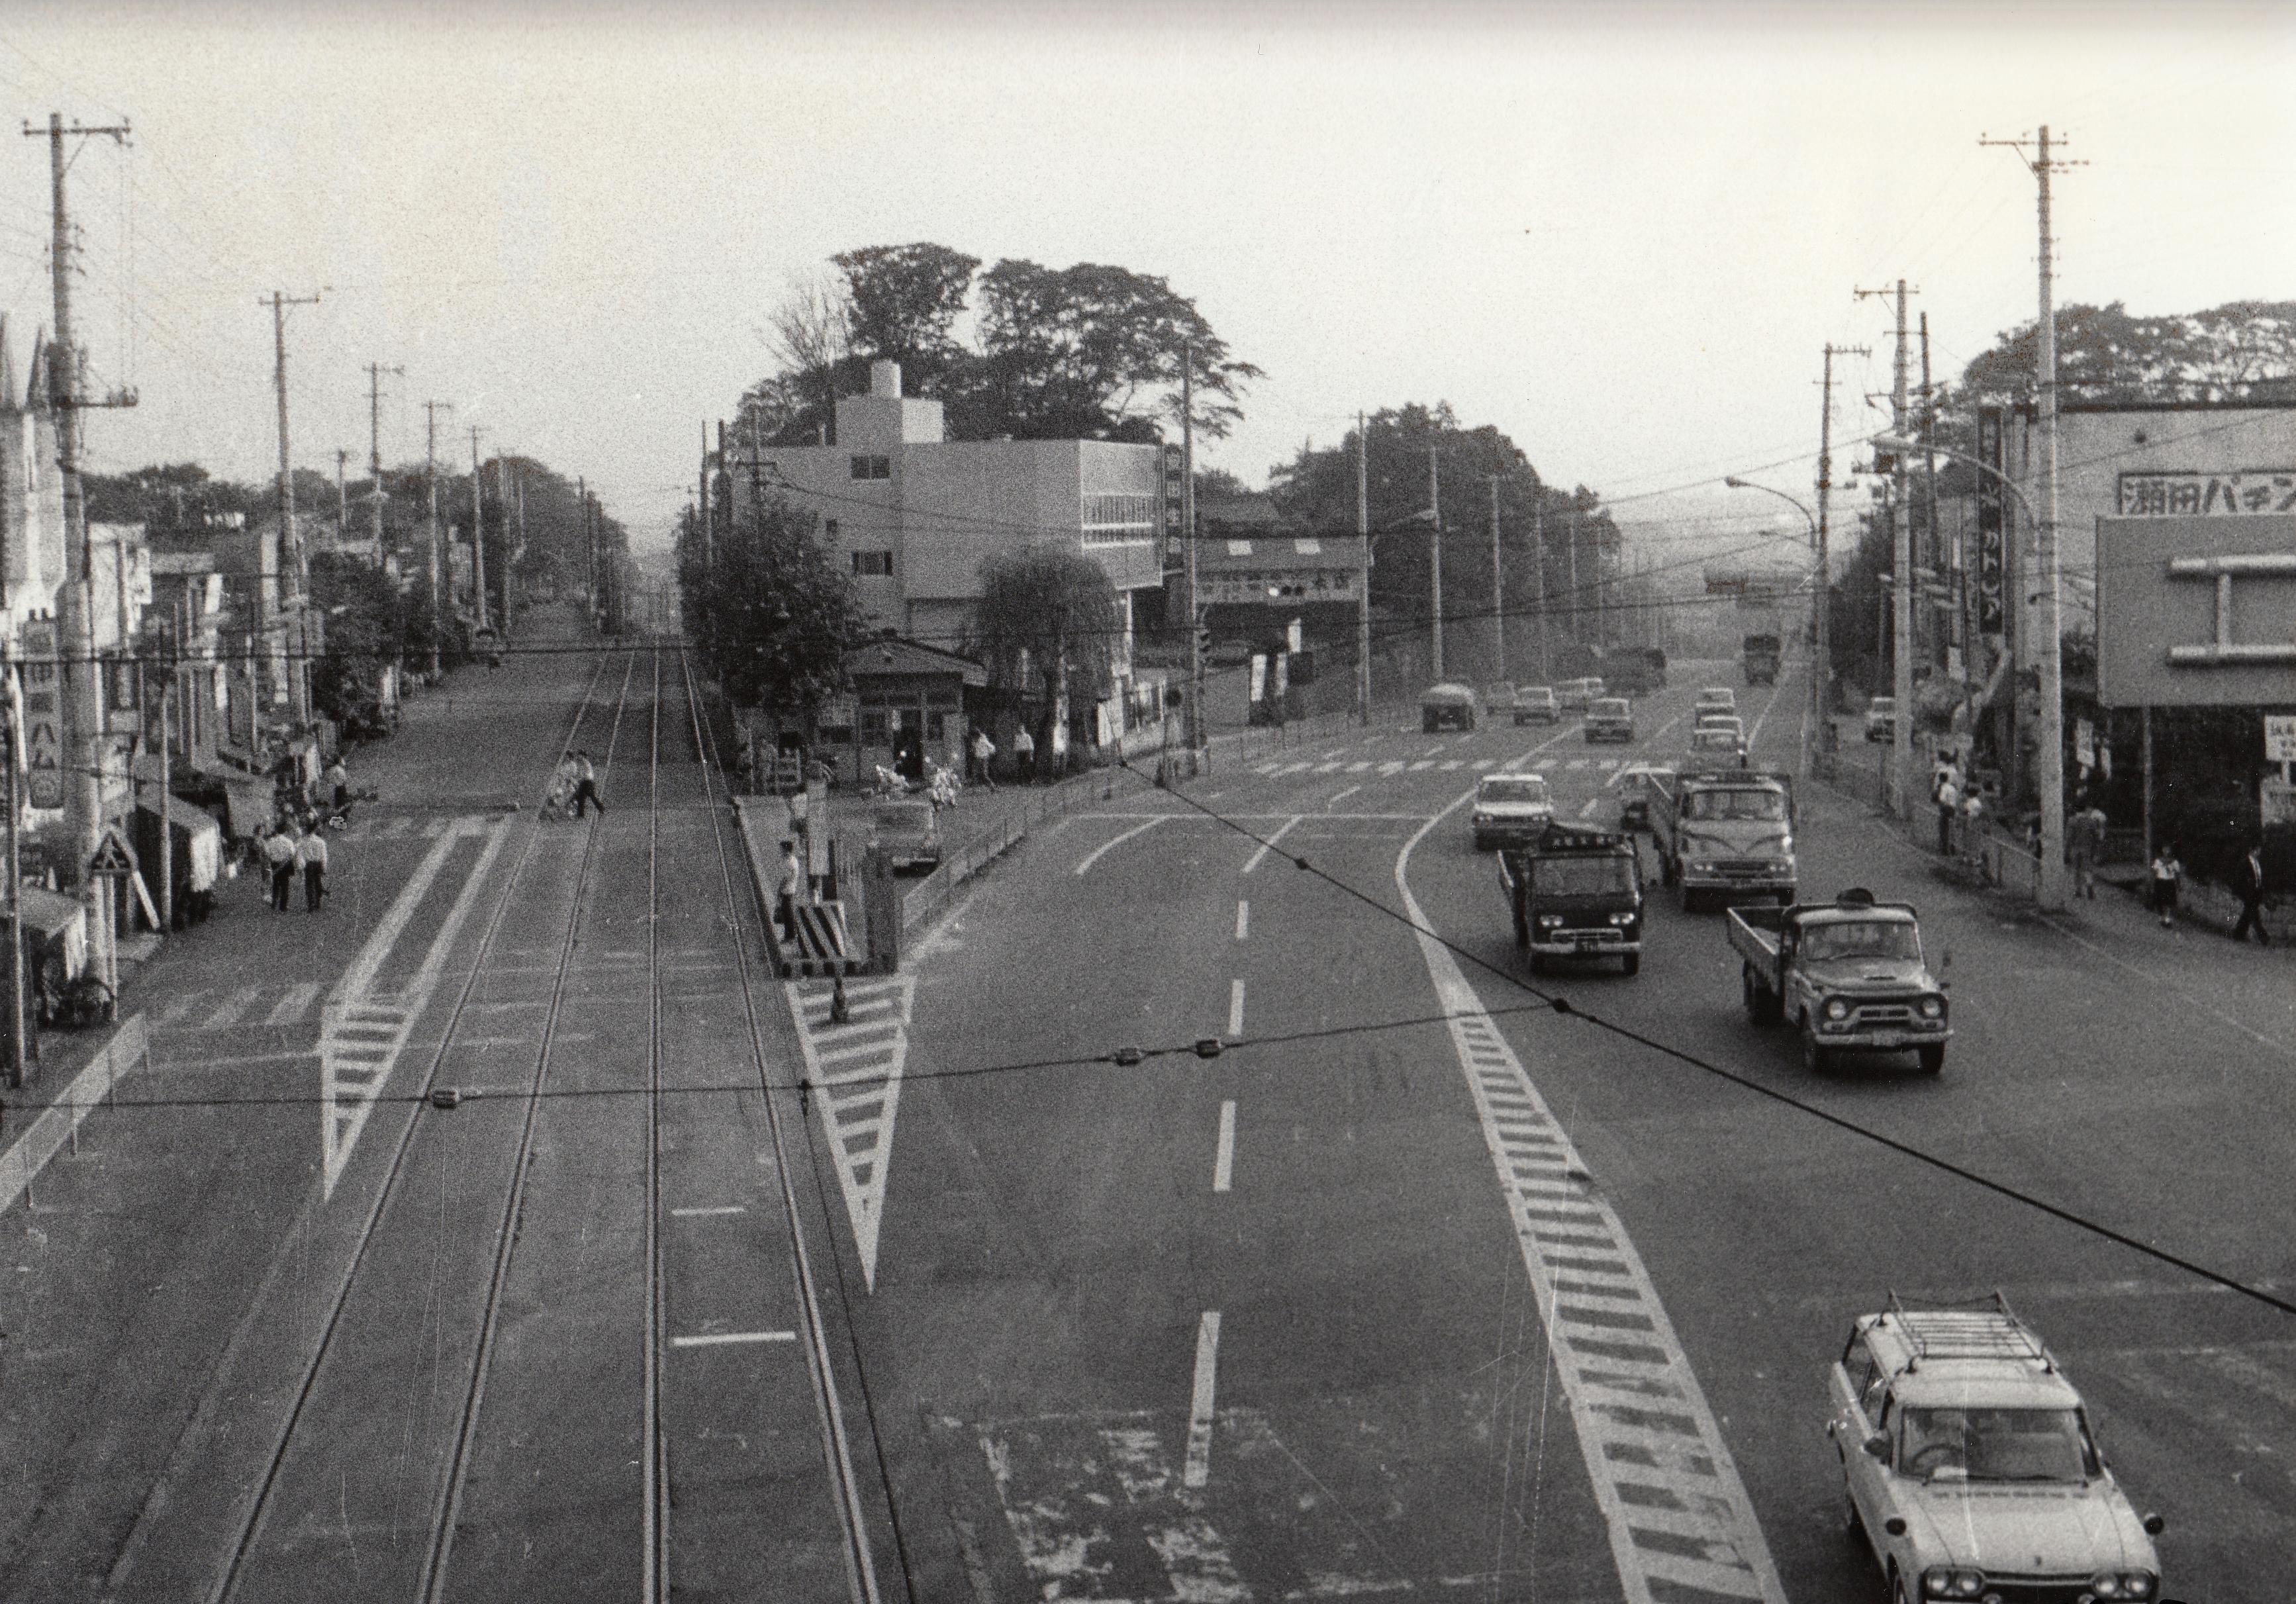 File:1968年の秋 玉電瀬田駅を望む.jpg - Wikipedia